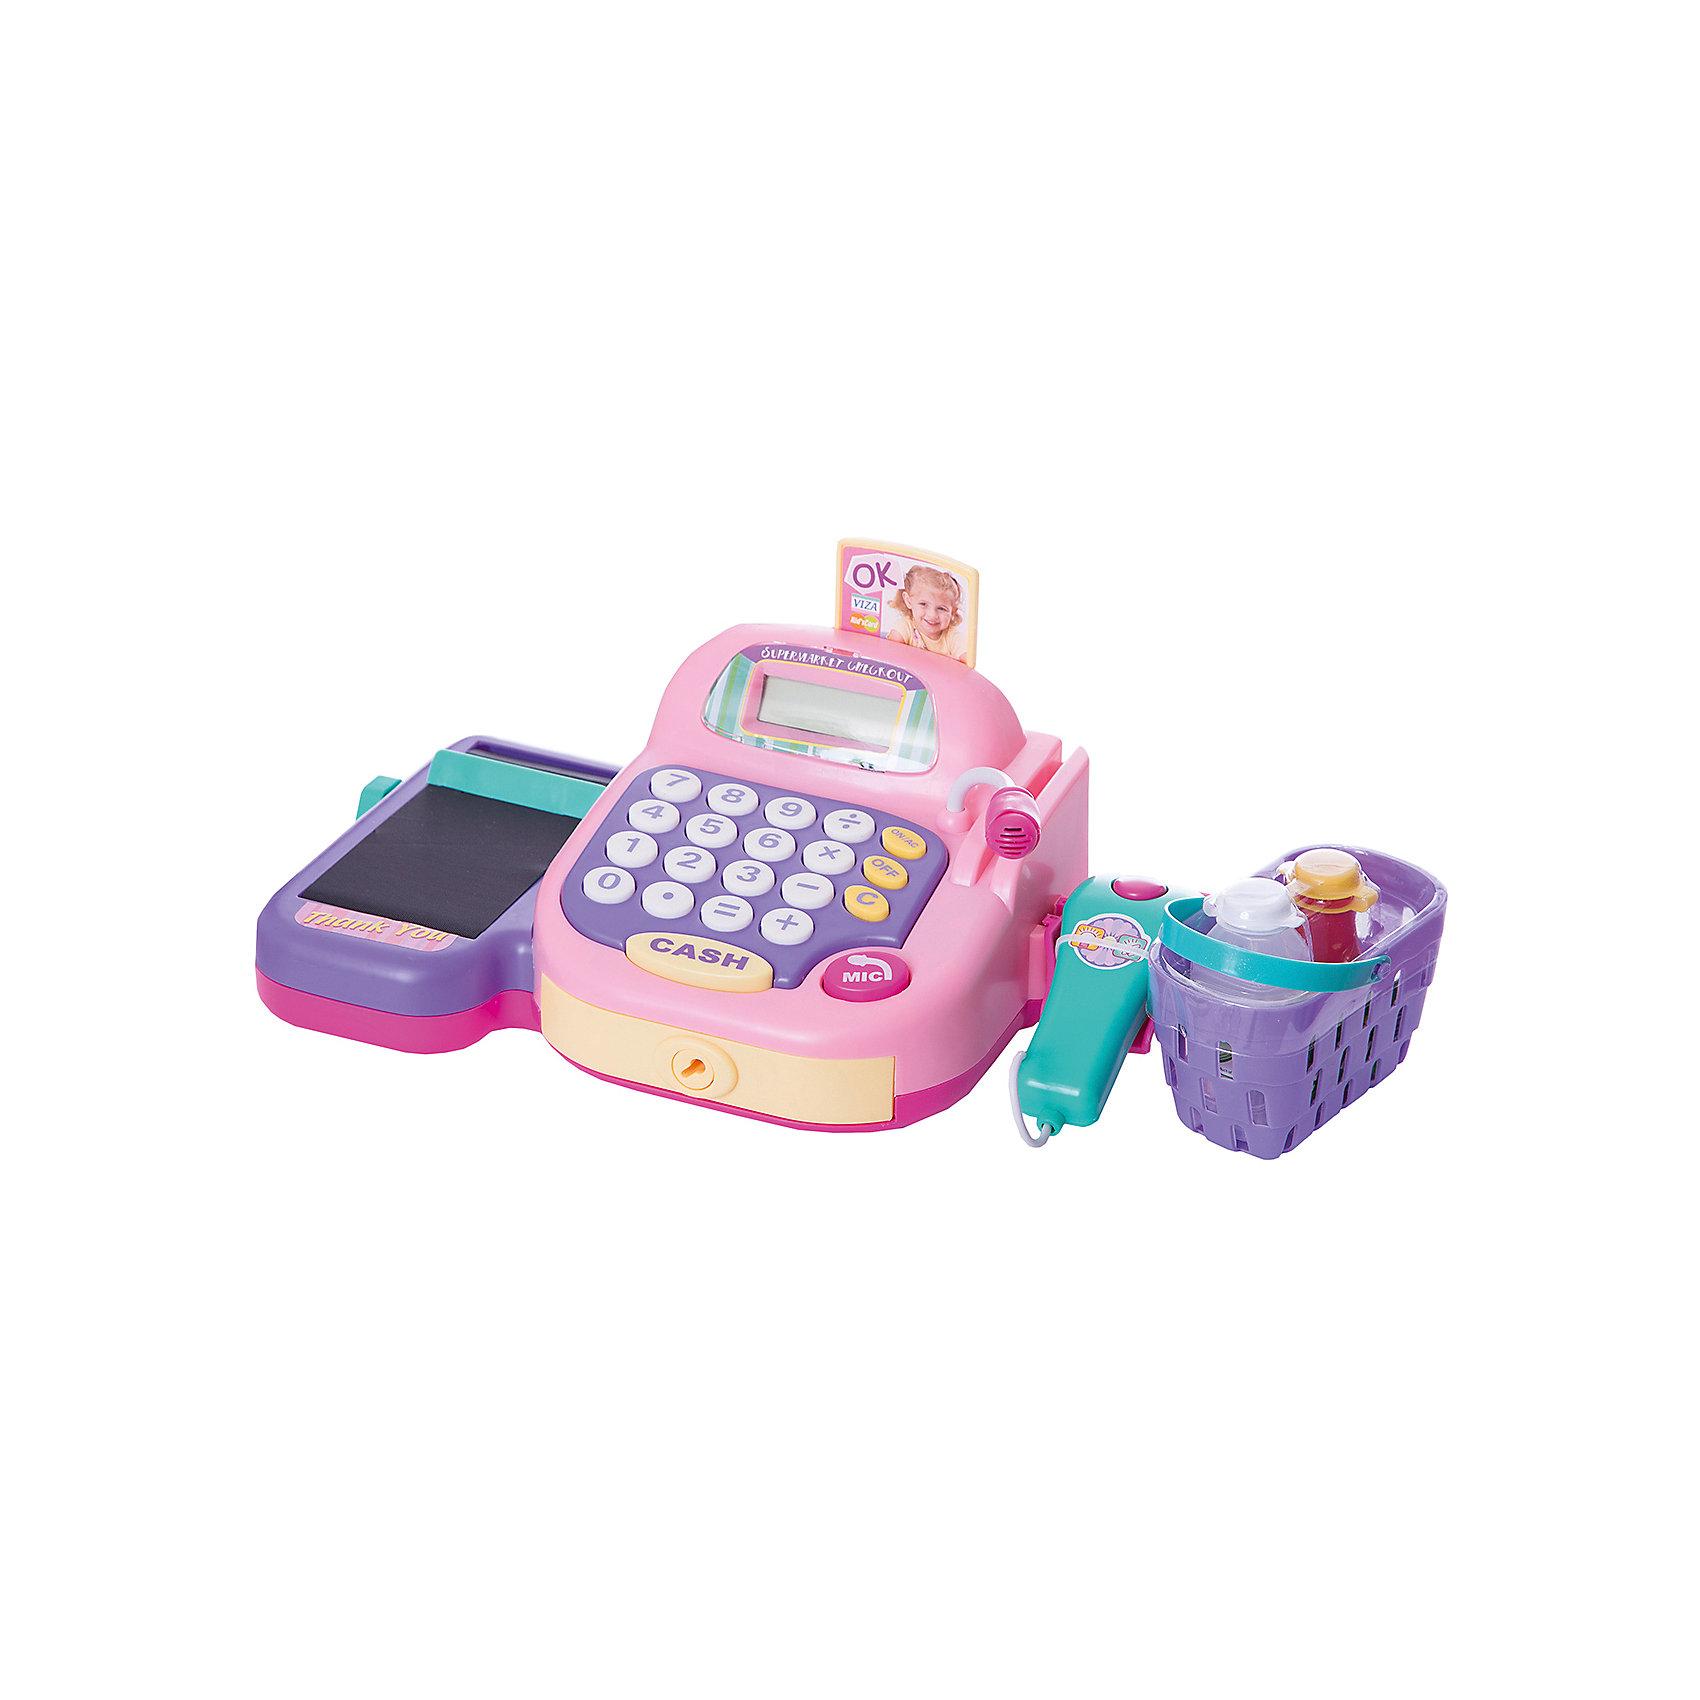 Keenway Набор Супермаркет: кассовый аппарат,продукты, со светом , звуком, Keenway keenway касса 30262 pink